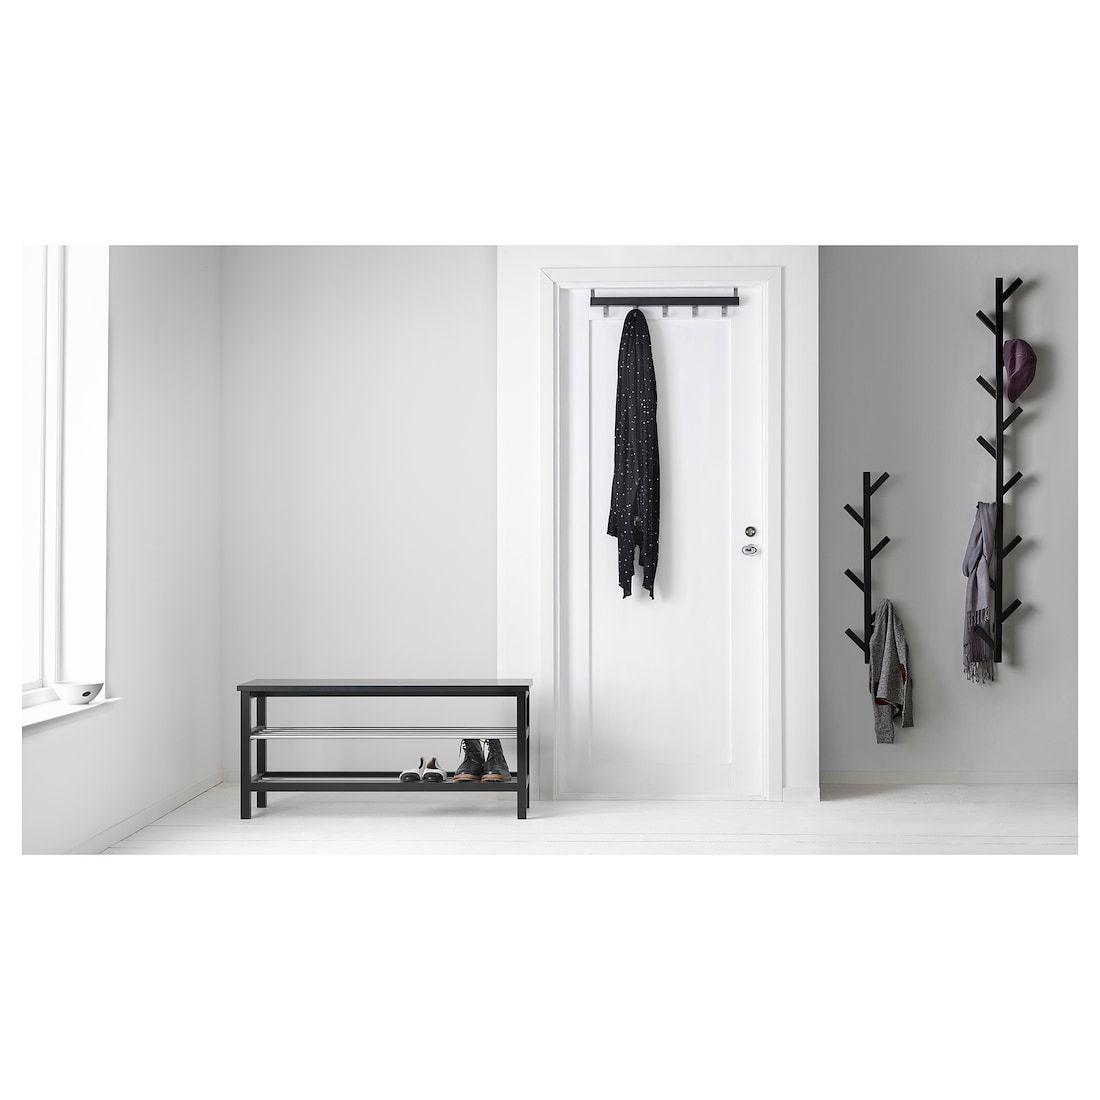 Ikea Tjusig Black Hanger In 2020 Bench With Shoe Storage Shoe